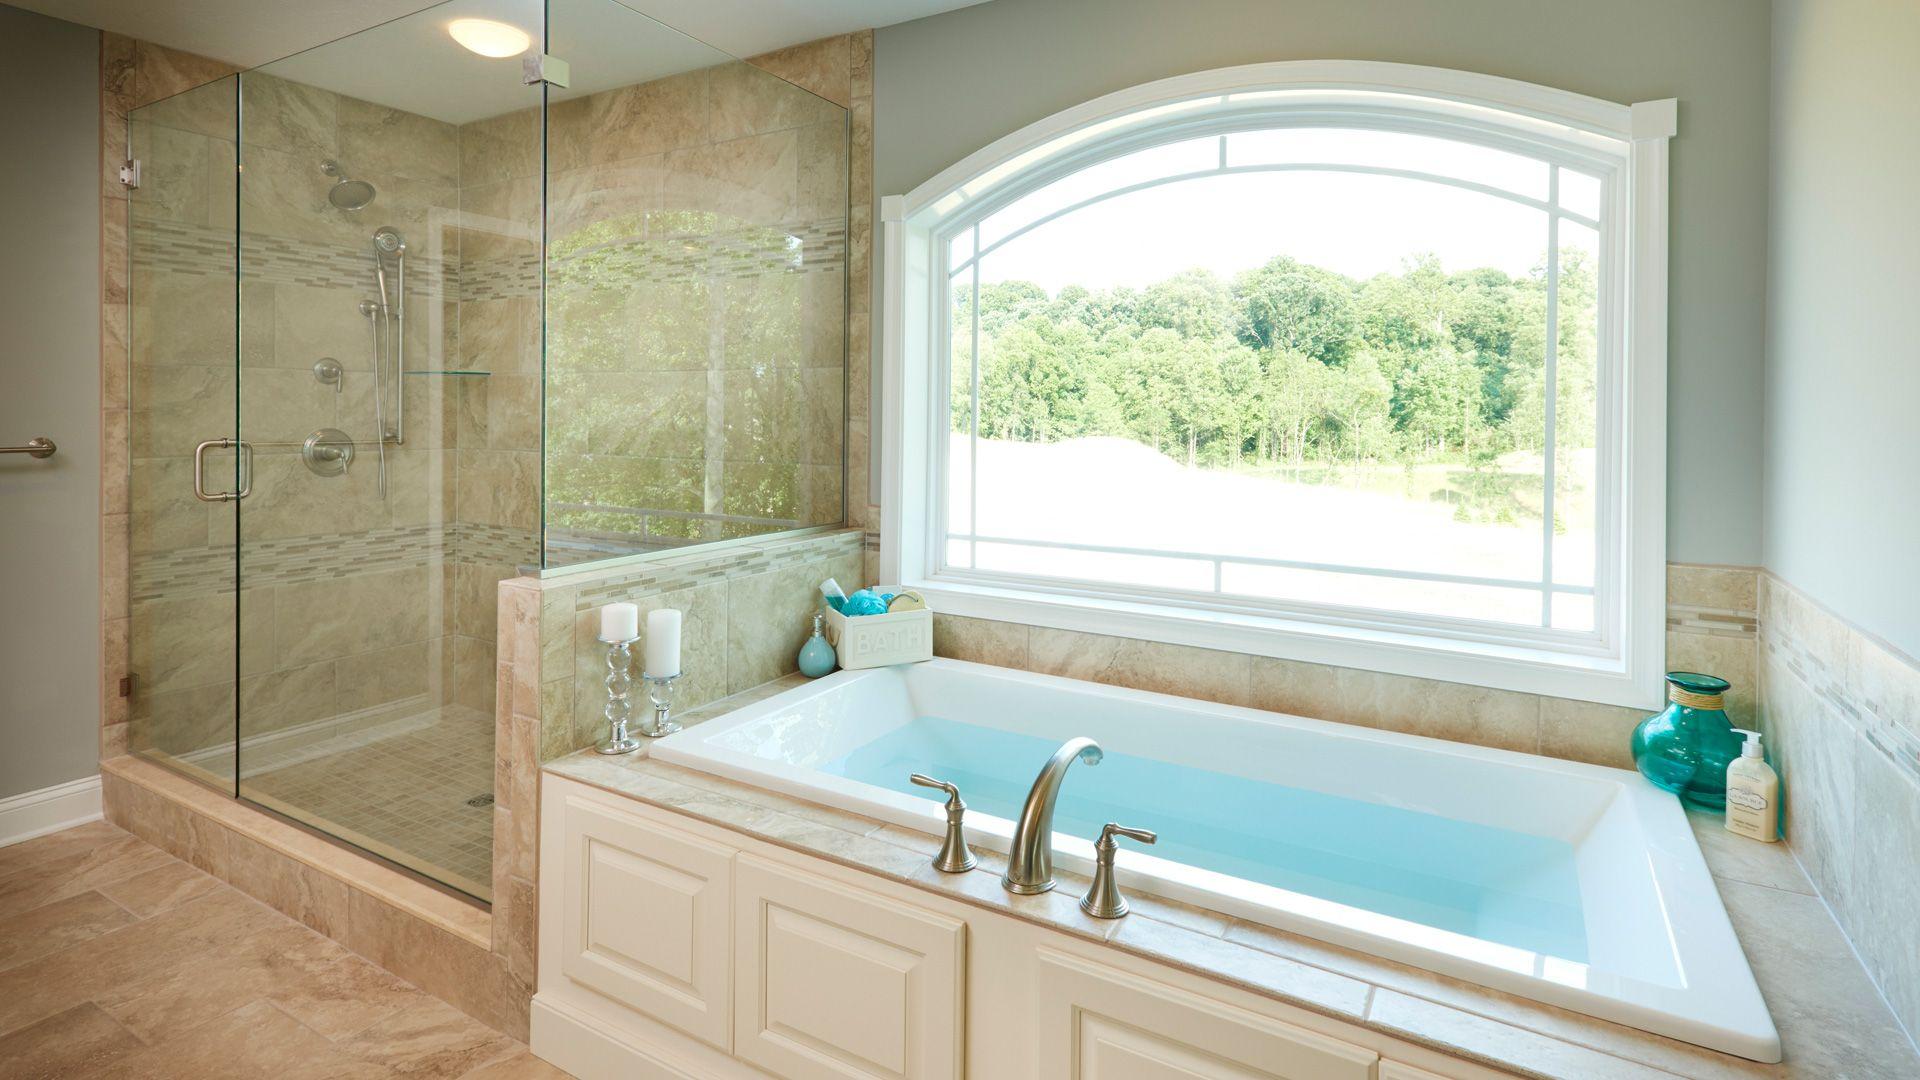 Contemporary Kohler Bathtub Ensign - Bathtub Design Ideas - valtak.com